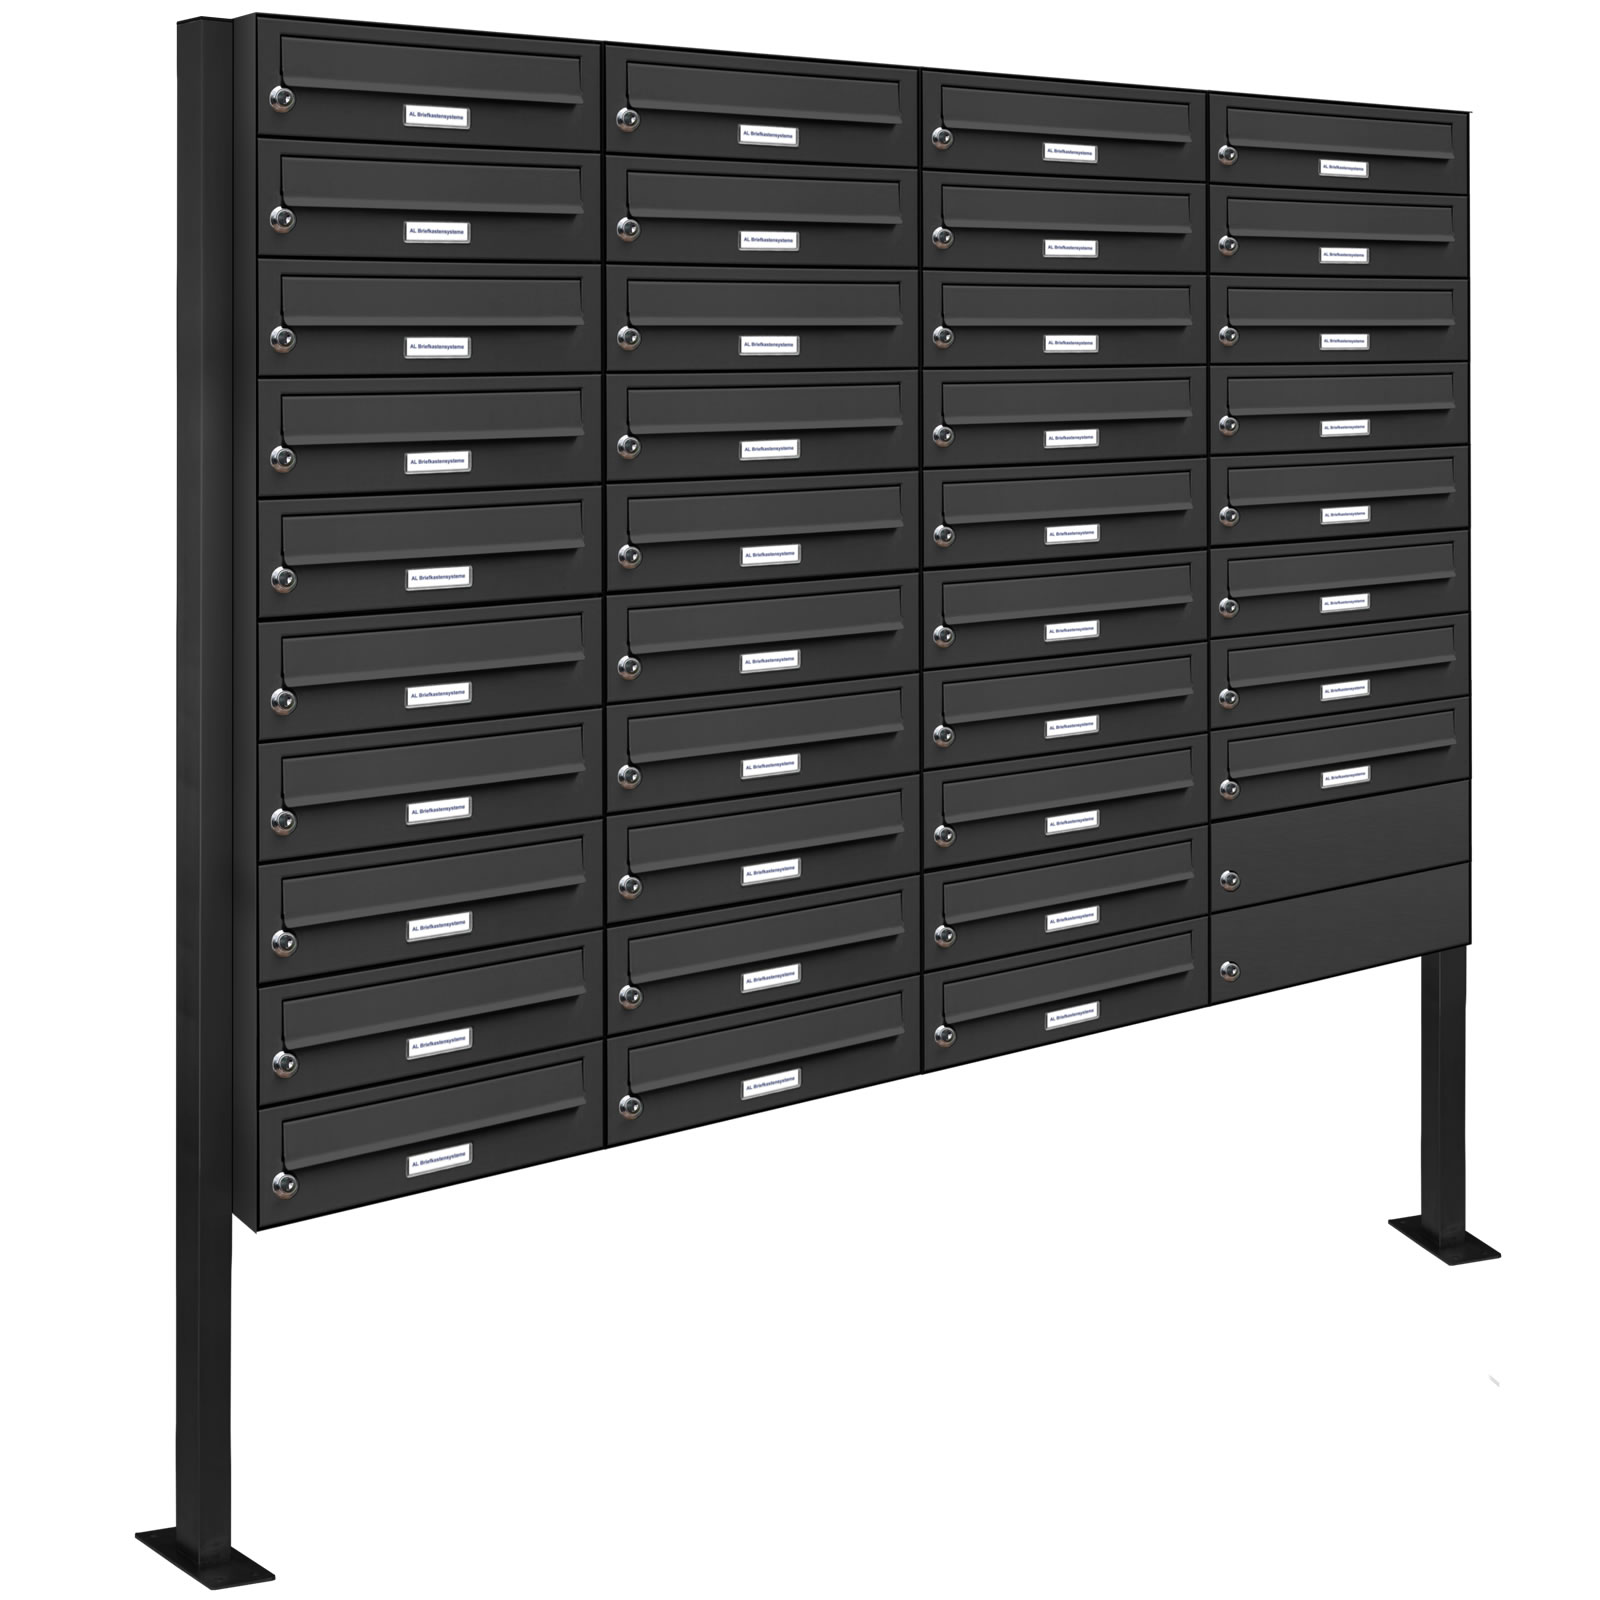 38er premium stand briefkasten anthrazit ral 7016 38 fach. Black Bedroom Furniture Sets. Home Design Ideas